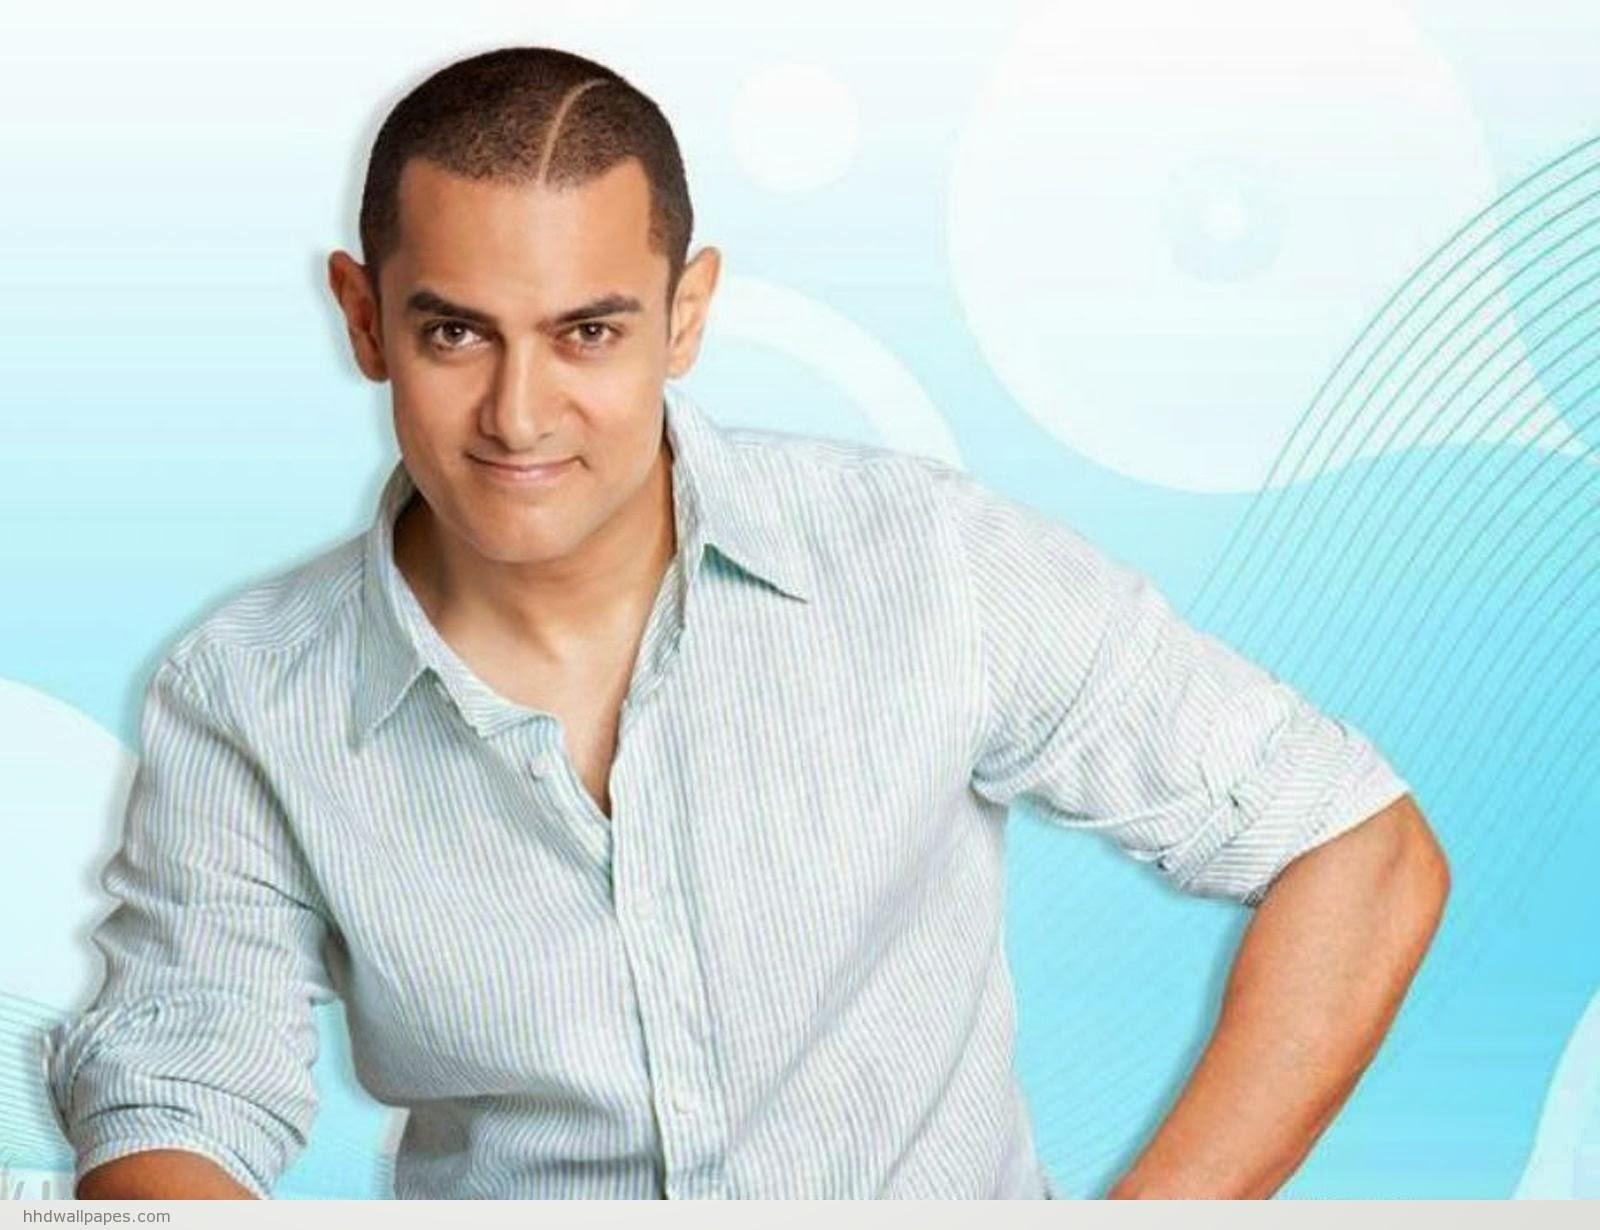 Bollywood actor aamir khan wallpapers hd desktop wallpapers free download - Aamir khan hd wallpaper ...